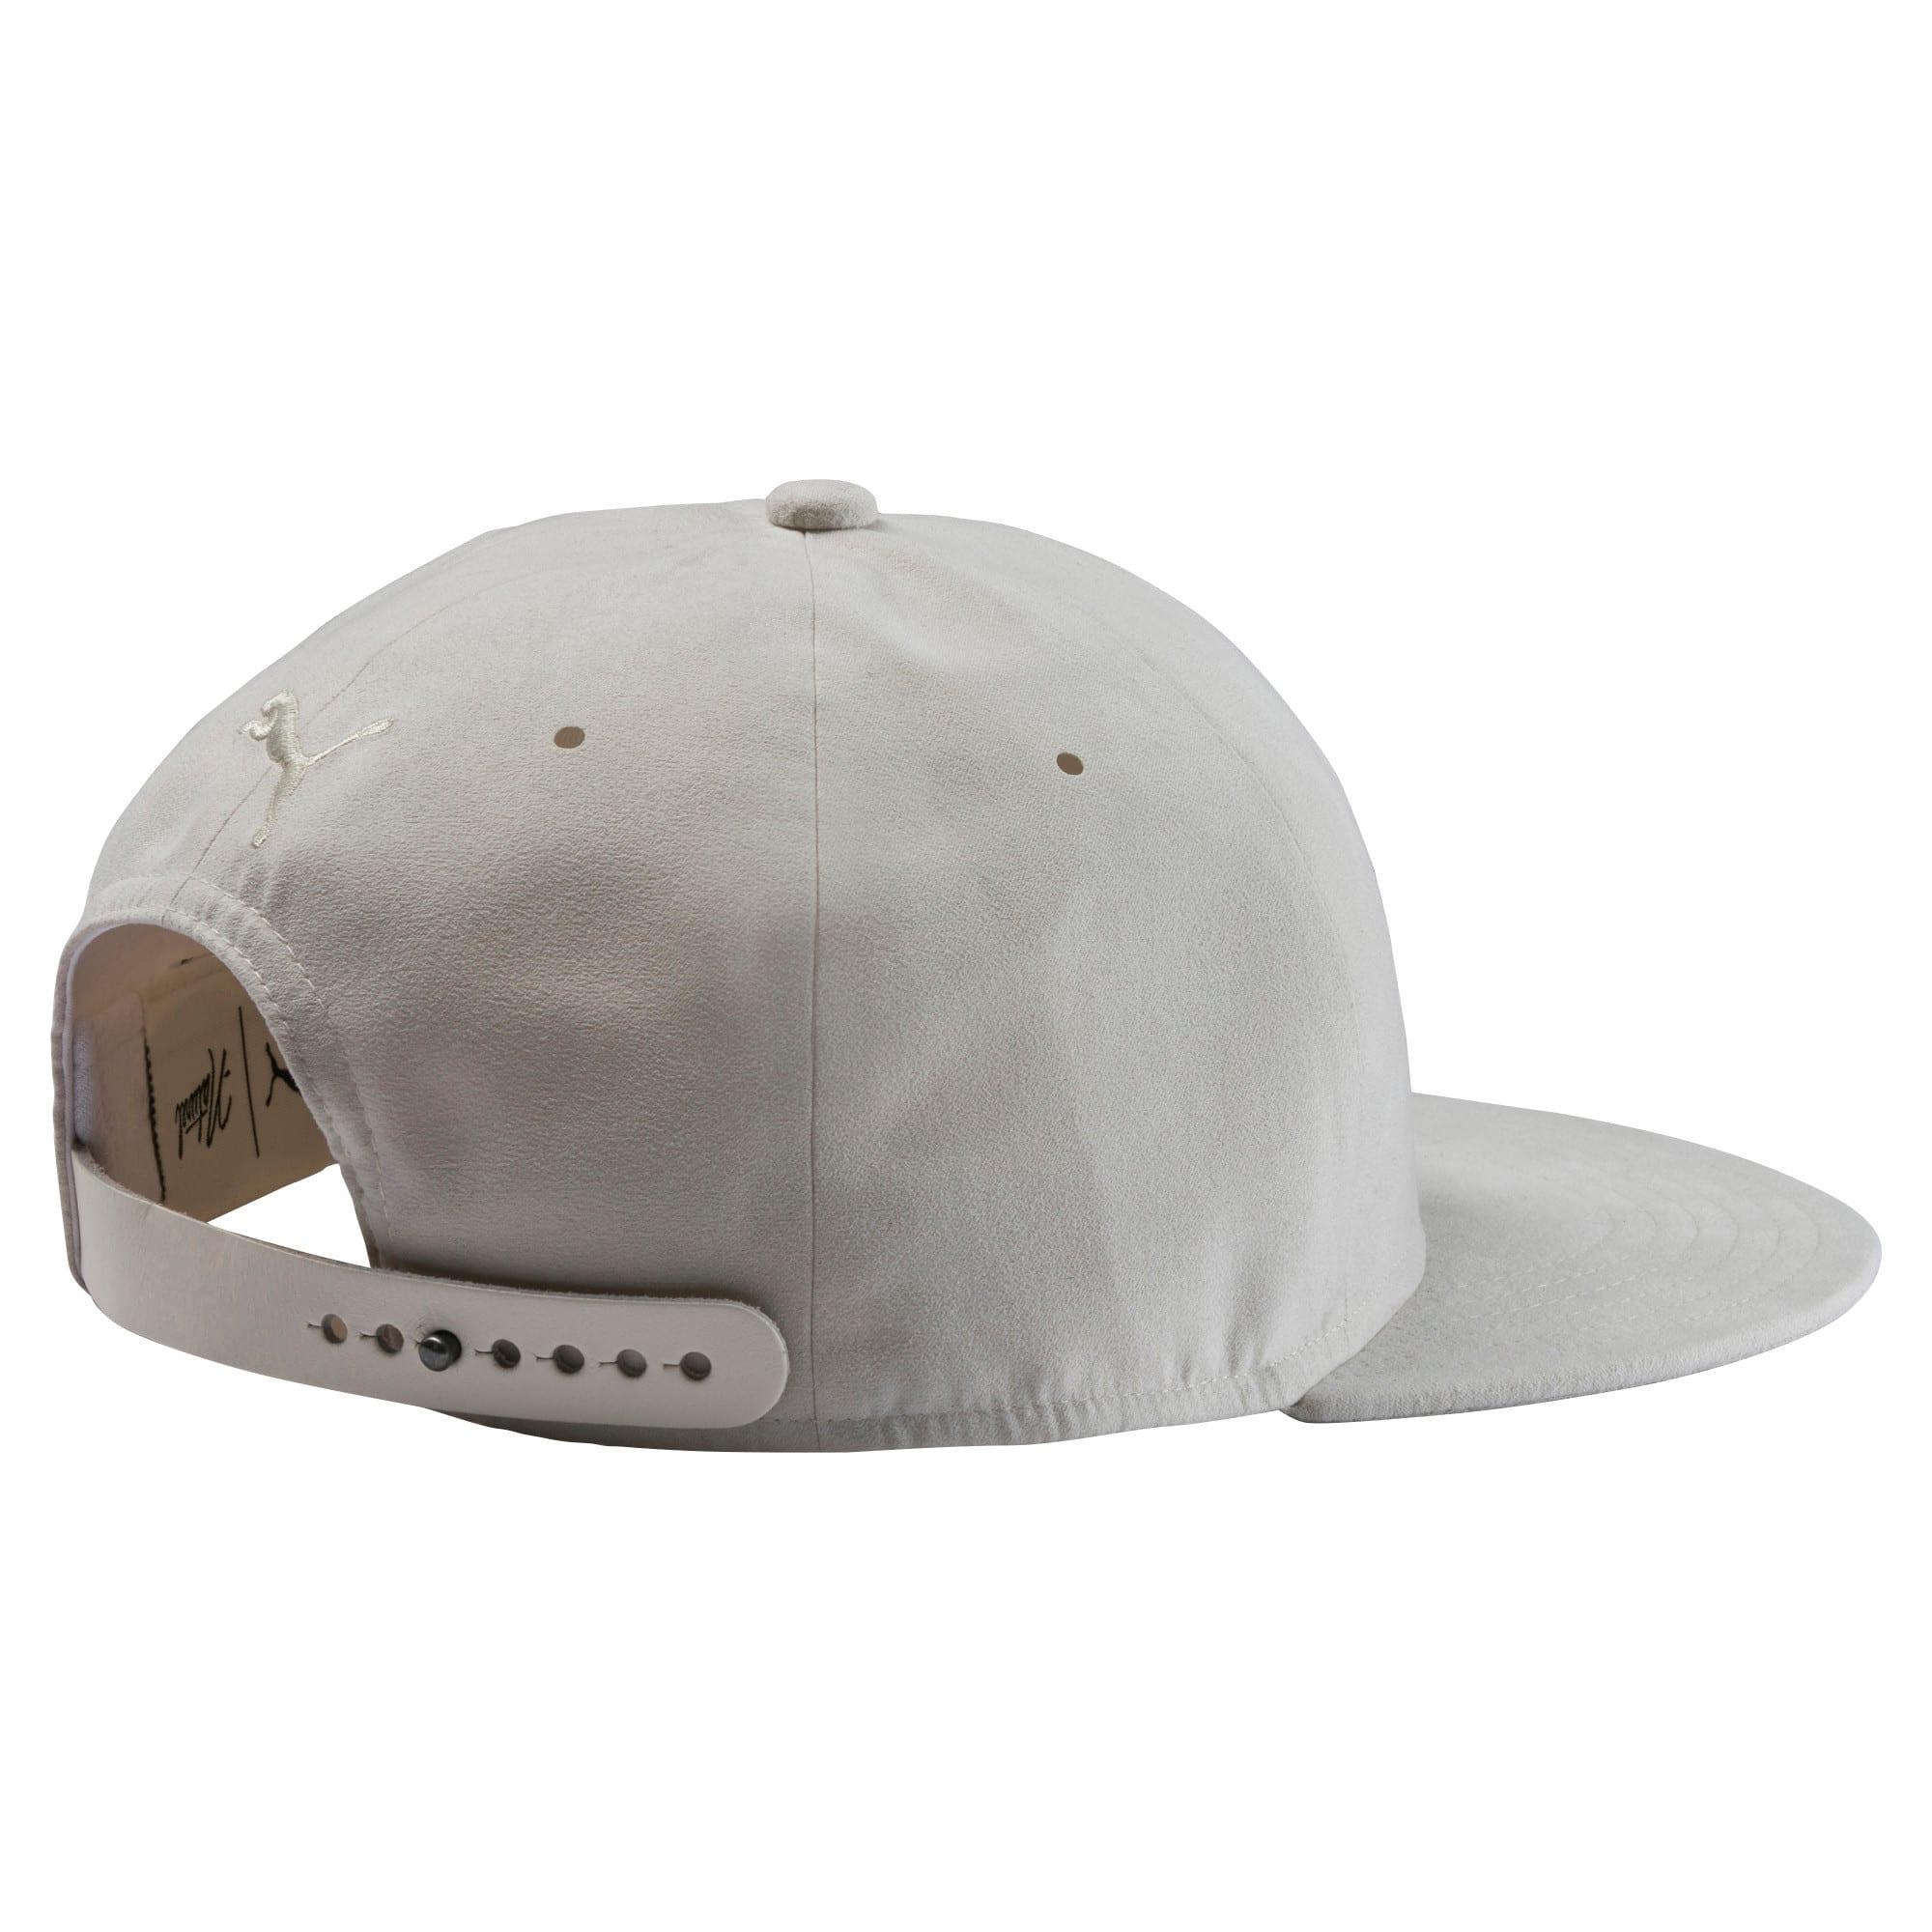 Thumbnail 3 of PUMA x NATUREL Hat, Whisper White, medium